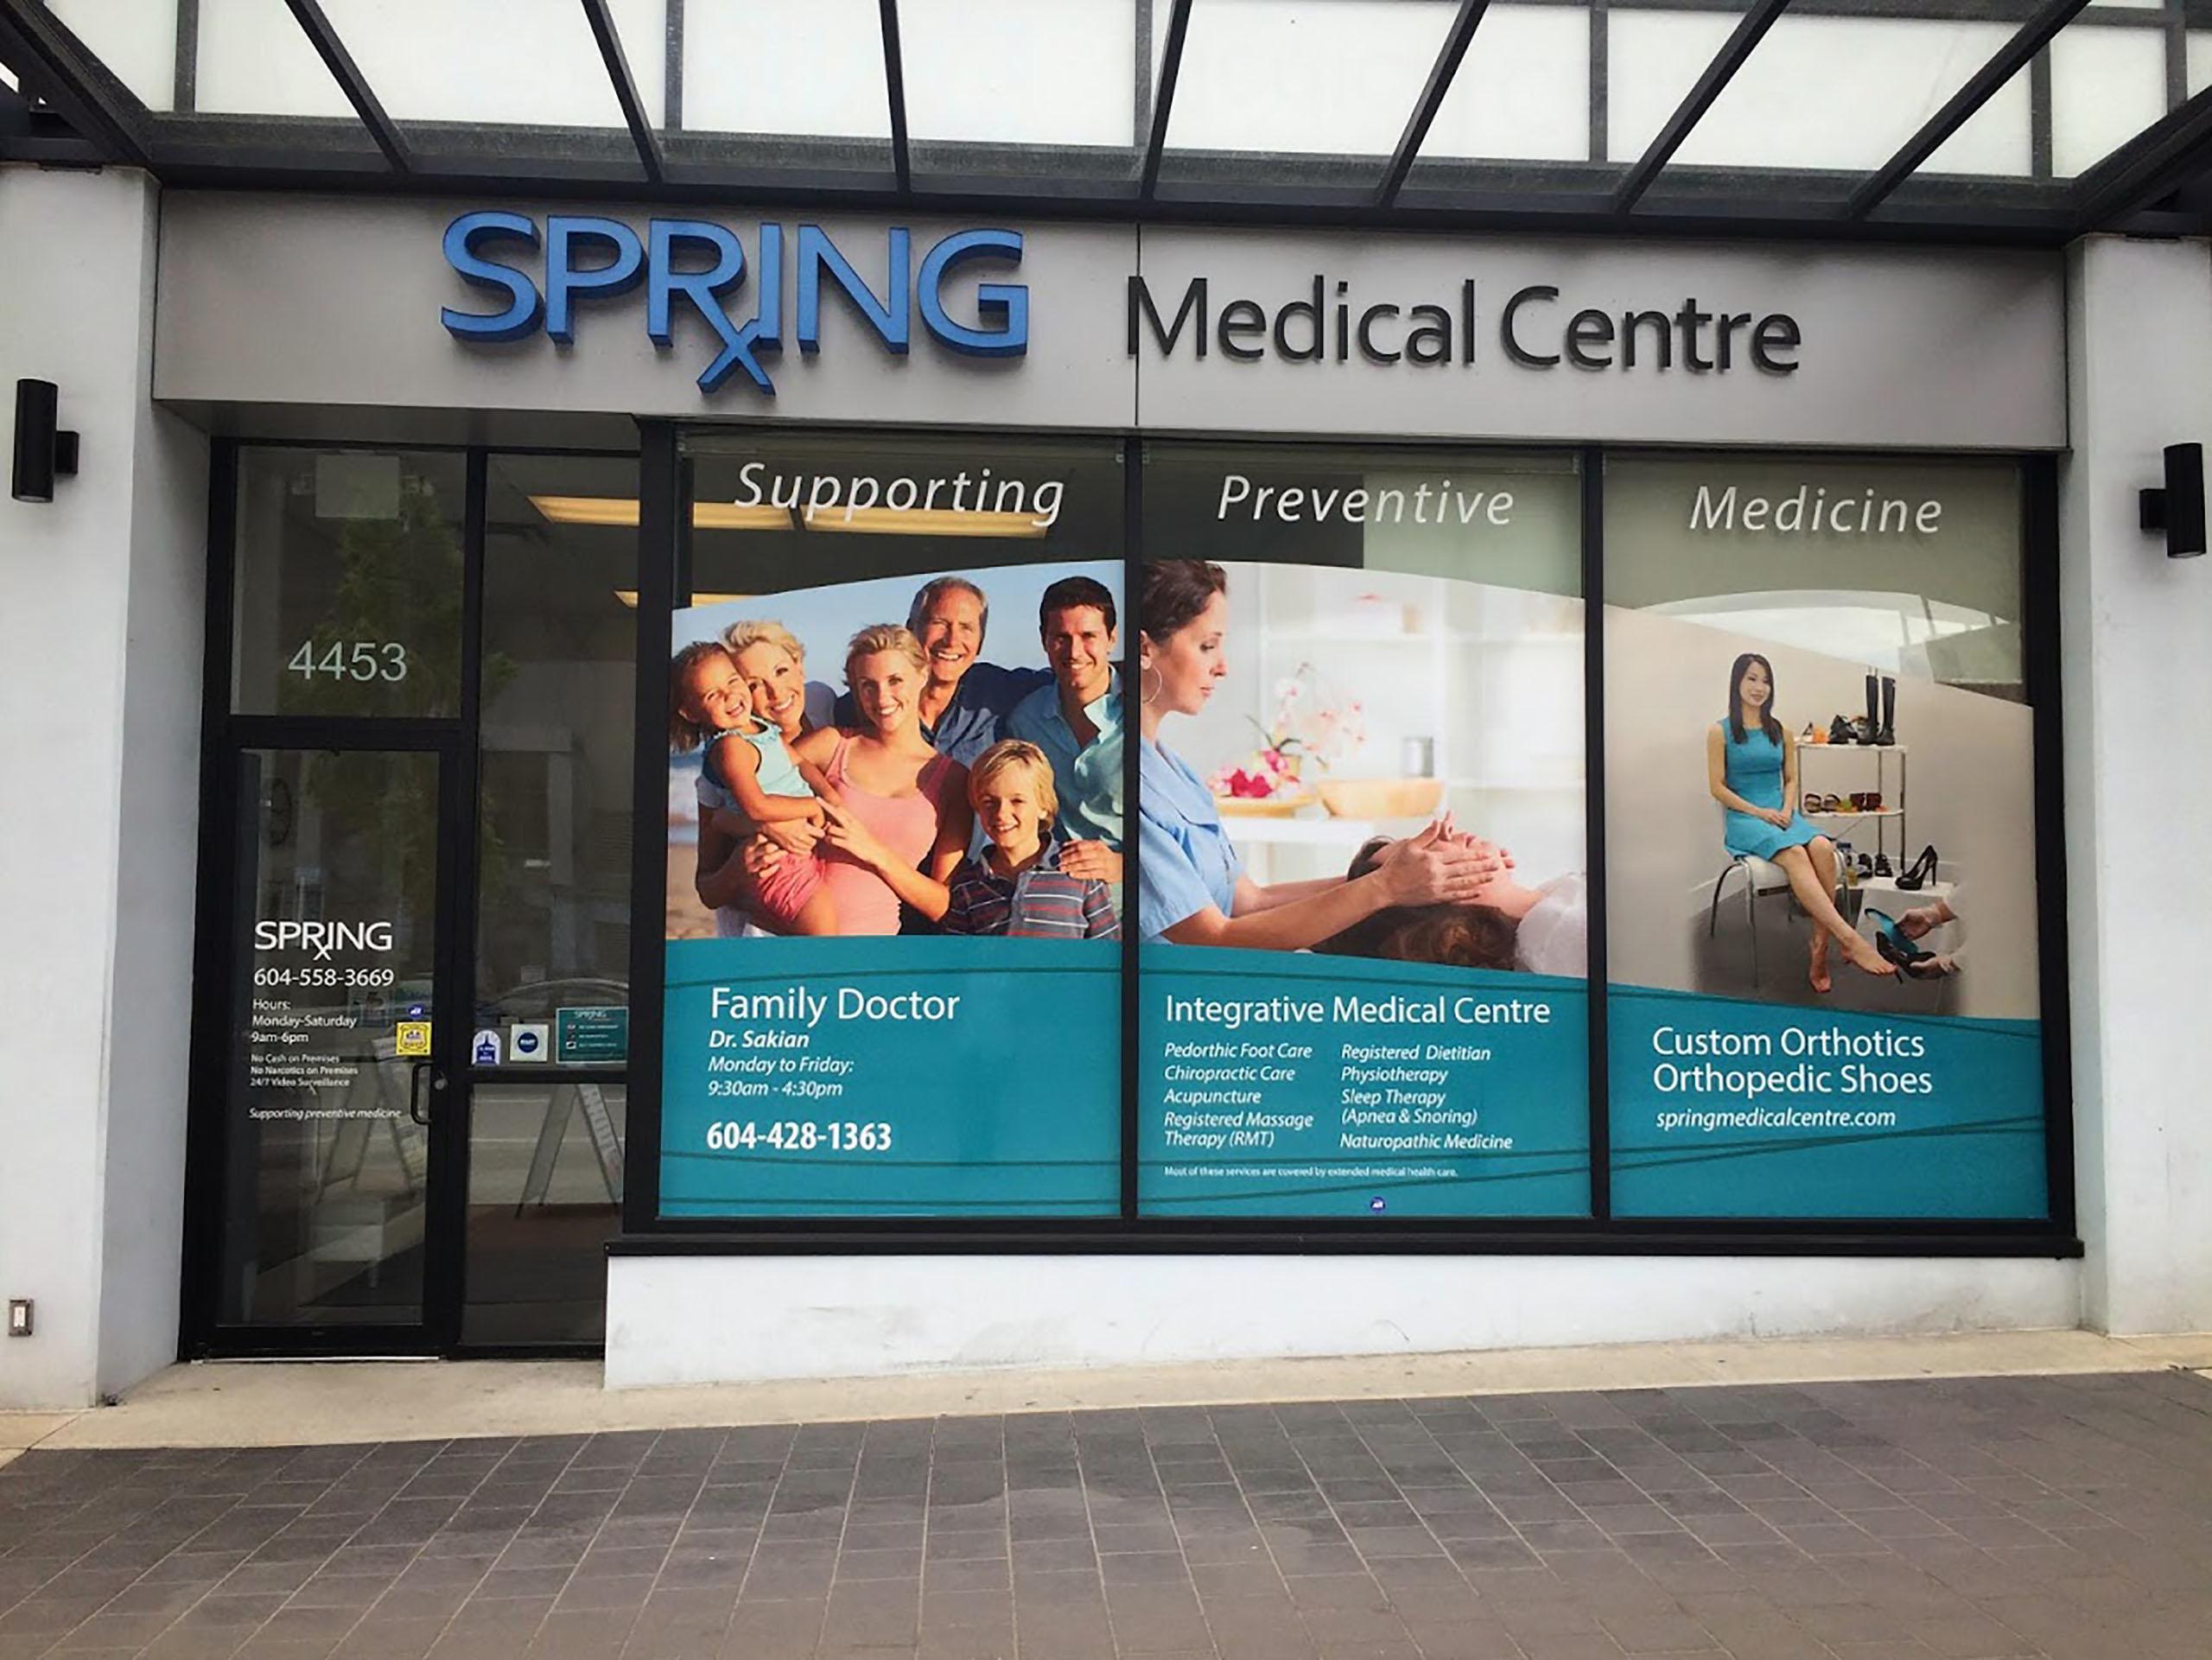 Spring Medical Centre